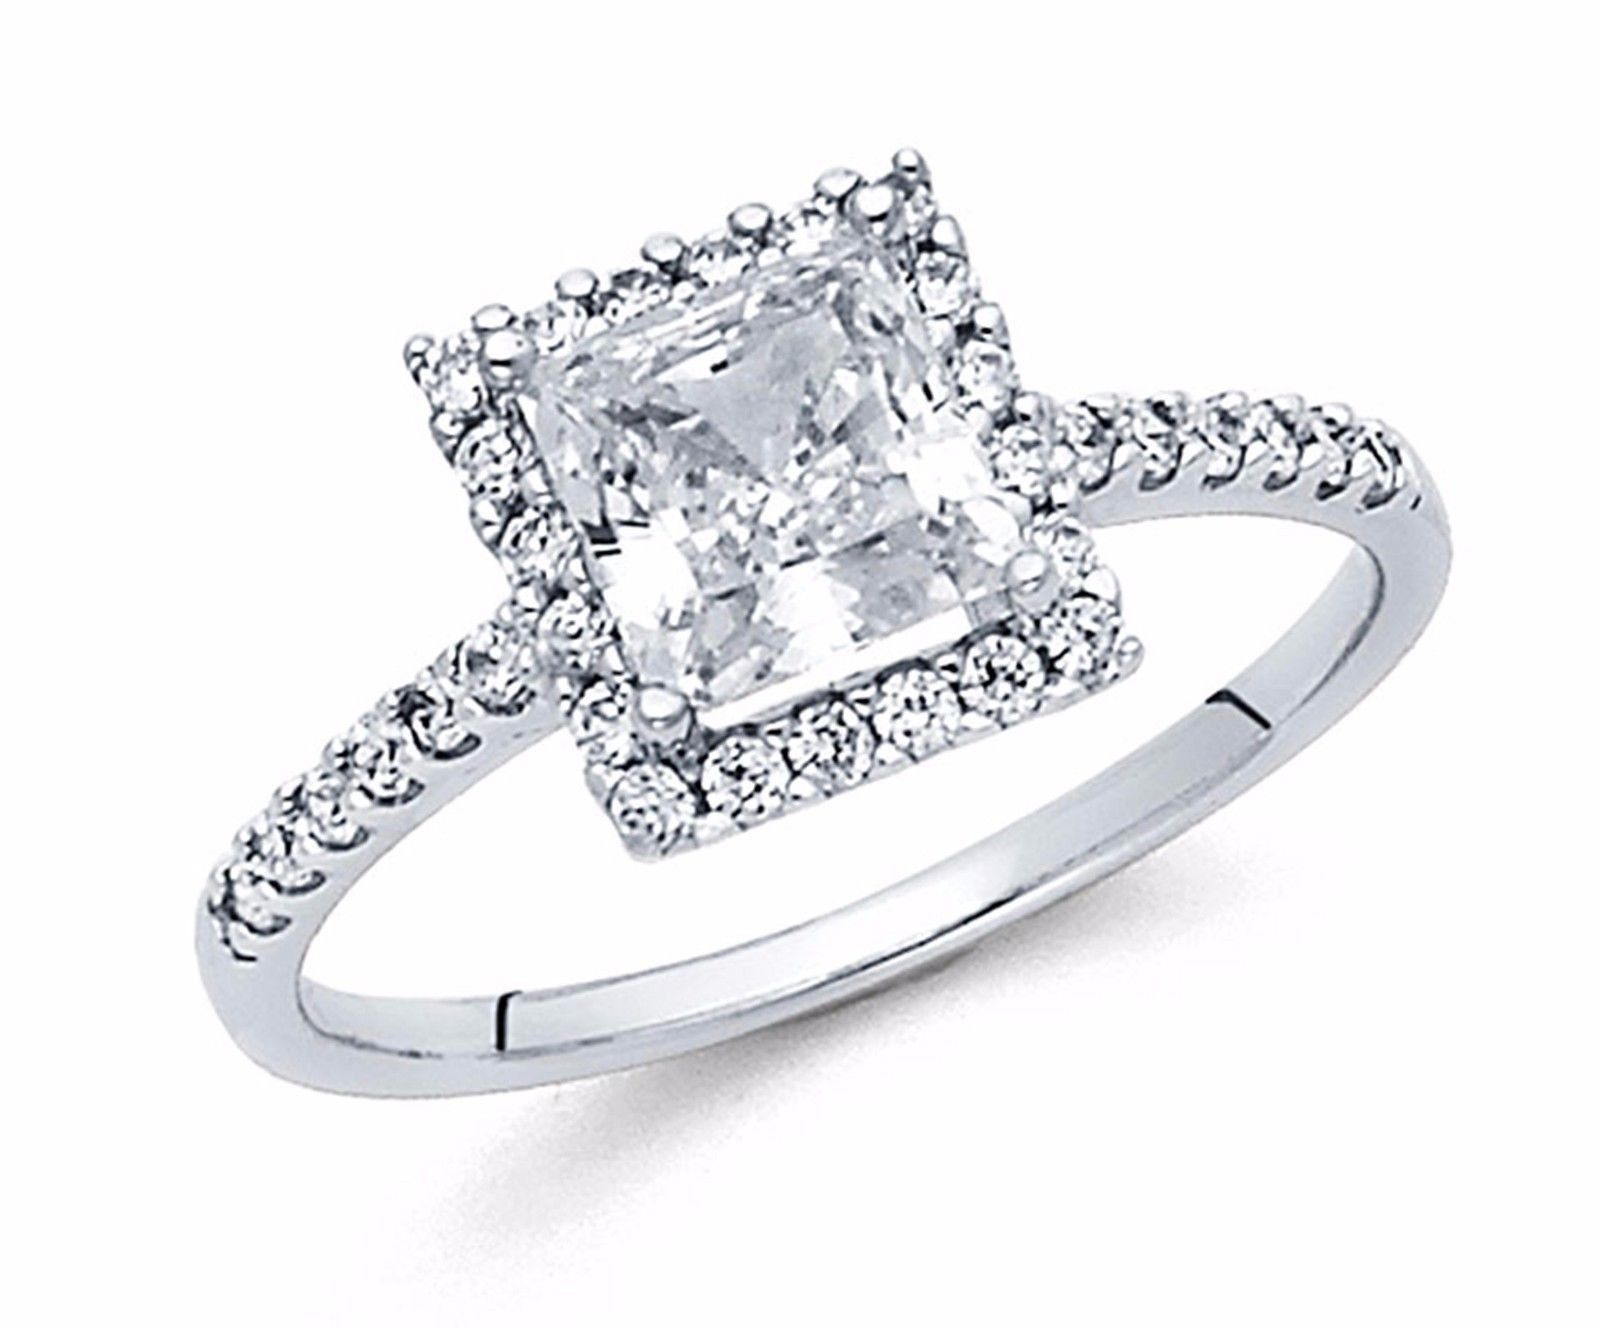 ct k solid white gold princess cut diamond solitaire